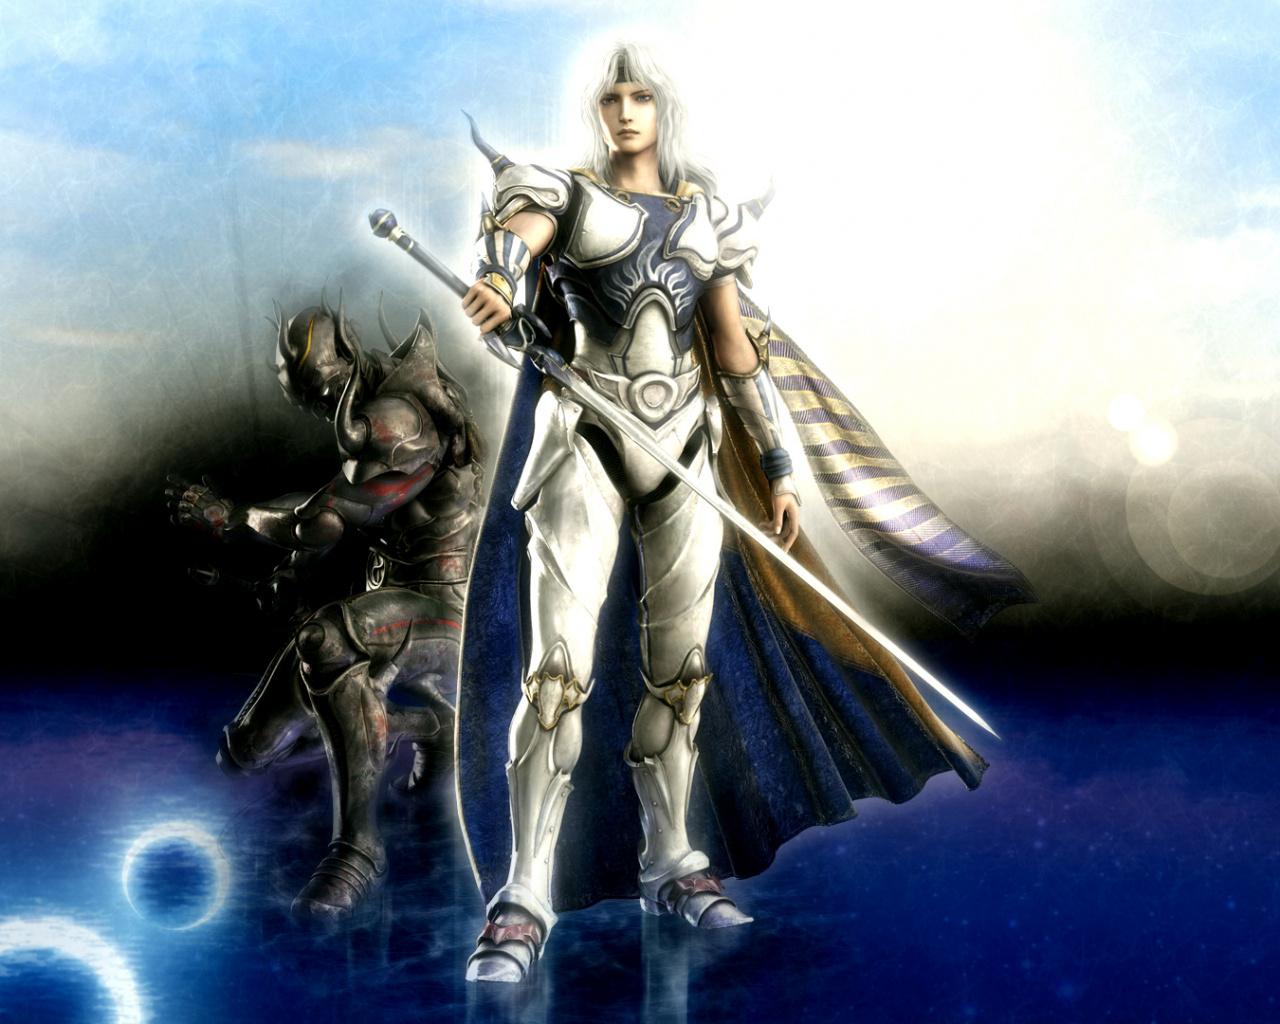 Mythology Cloud Strife Woman Warrior Video Games Final